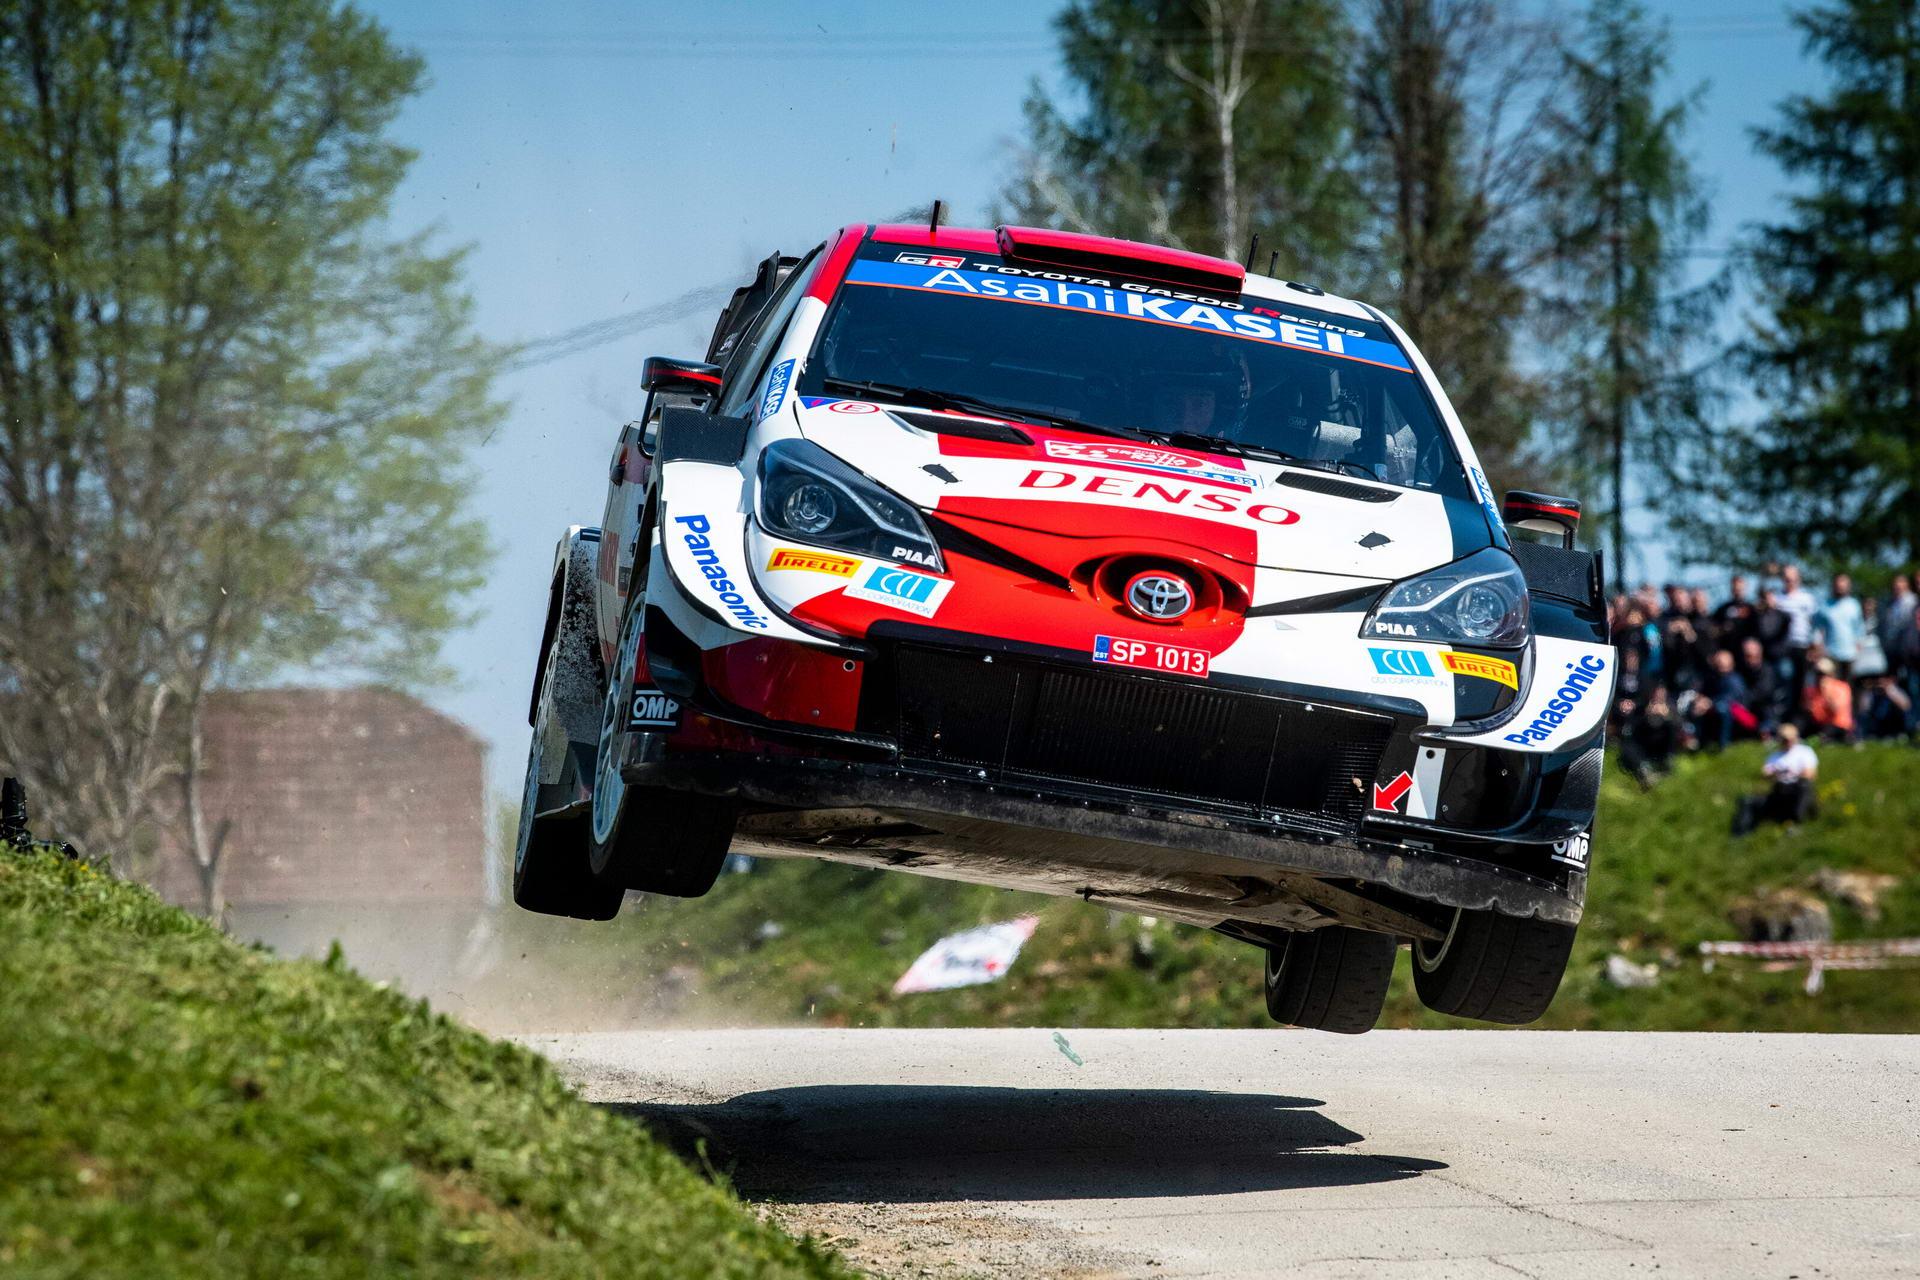 WRC - Closest Asphalt Finish - Croatia 2021